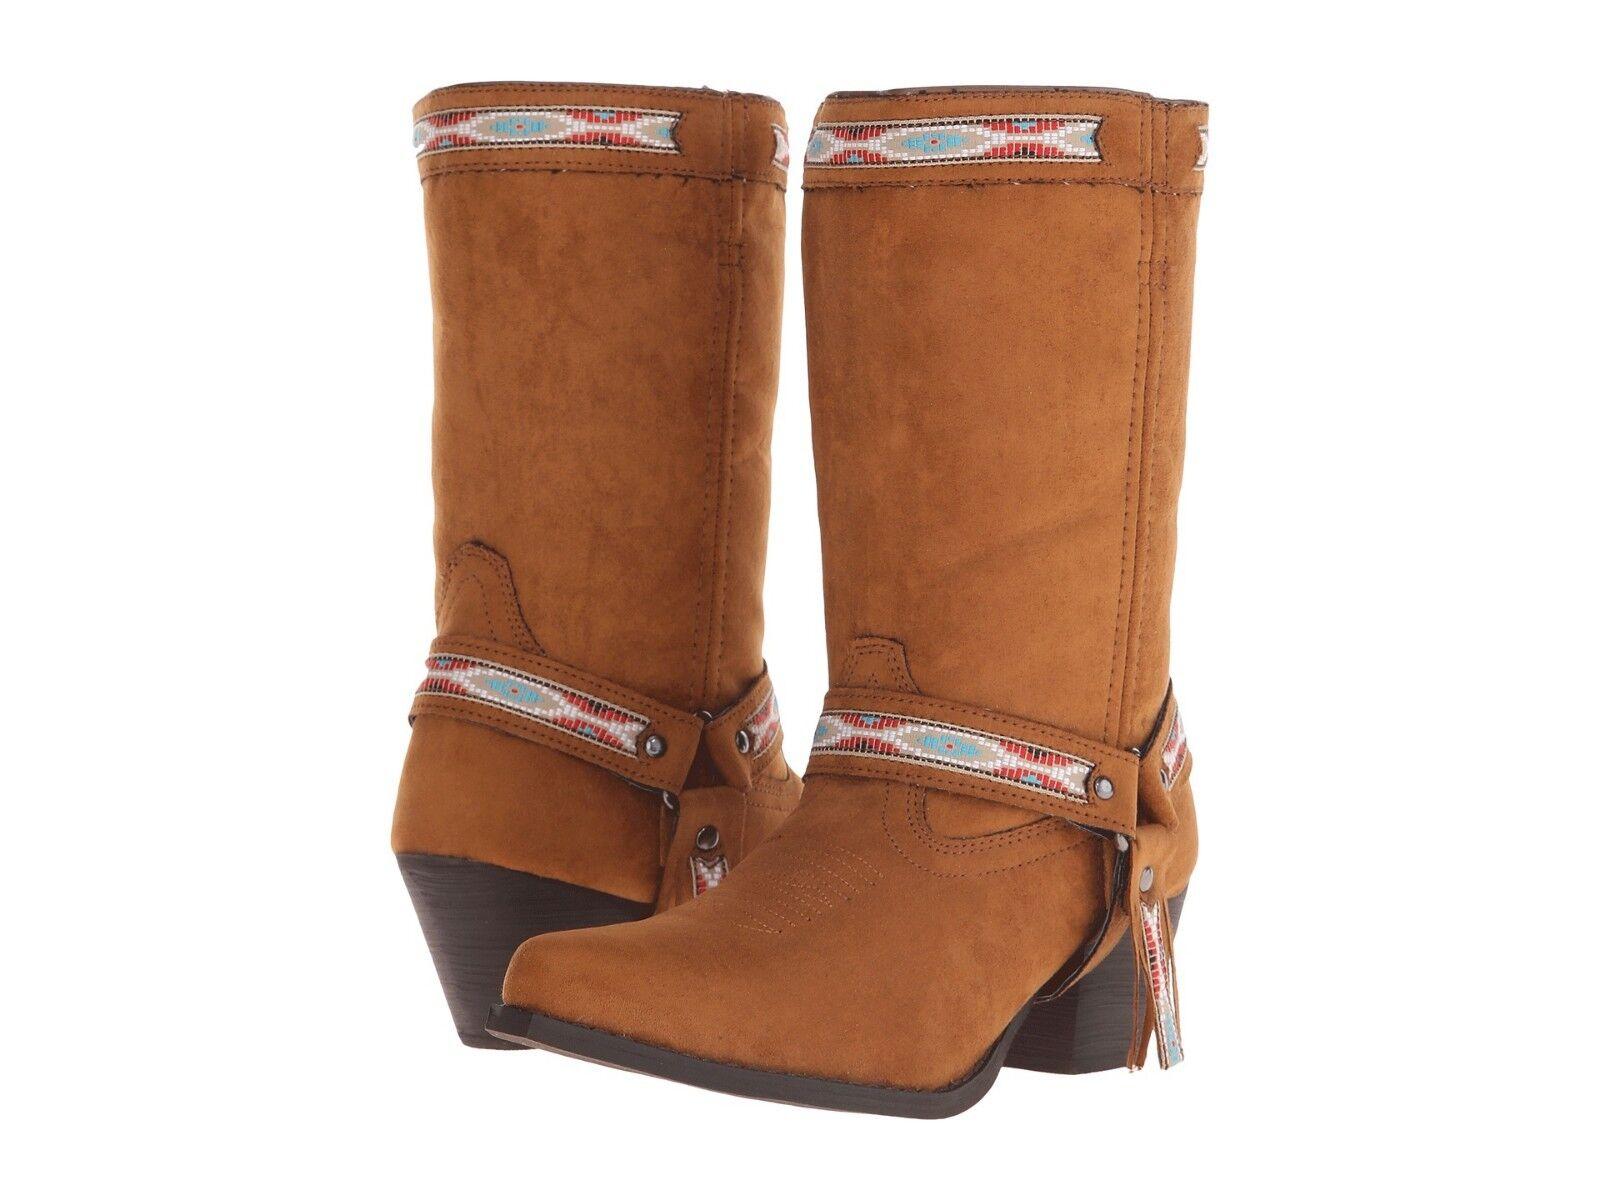 Dingo Womens Cowboy Boot Embroidery Martine Rust Brown Copper 7 Medium NEW NIB